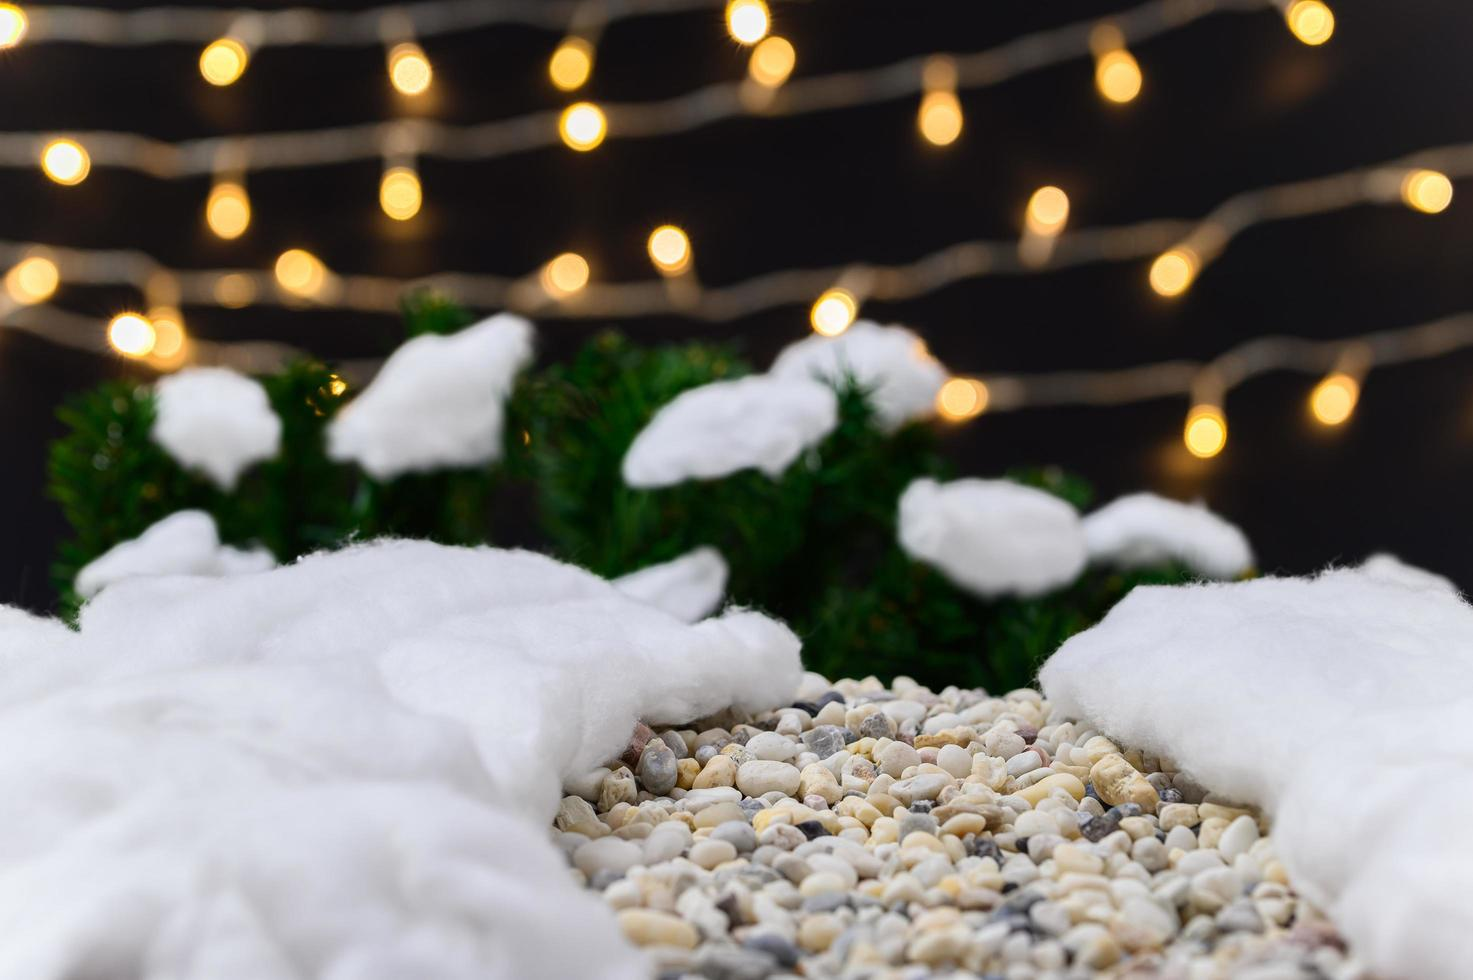 Merry Christmas background photo